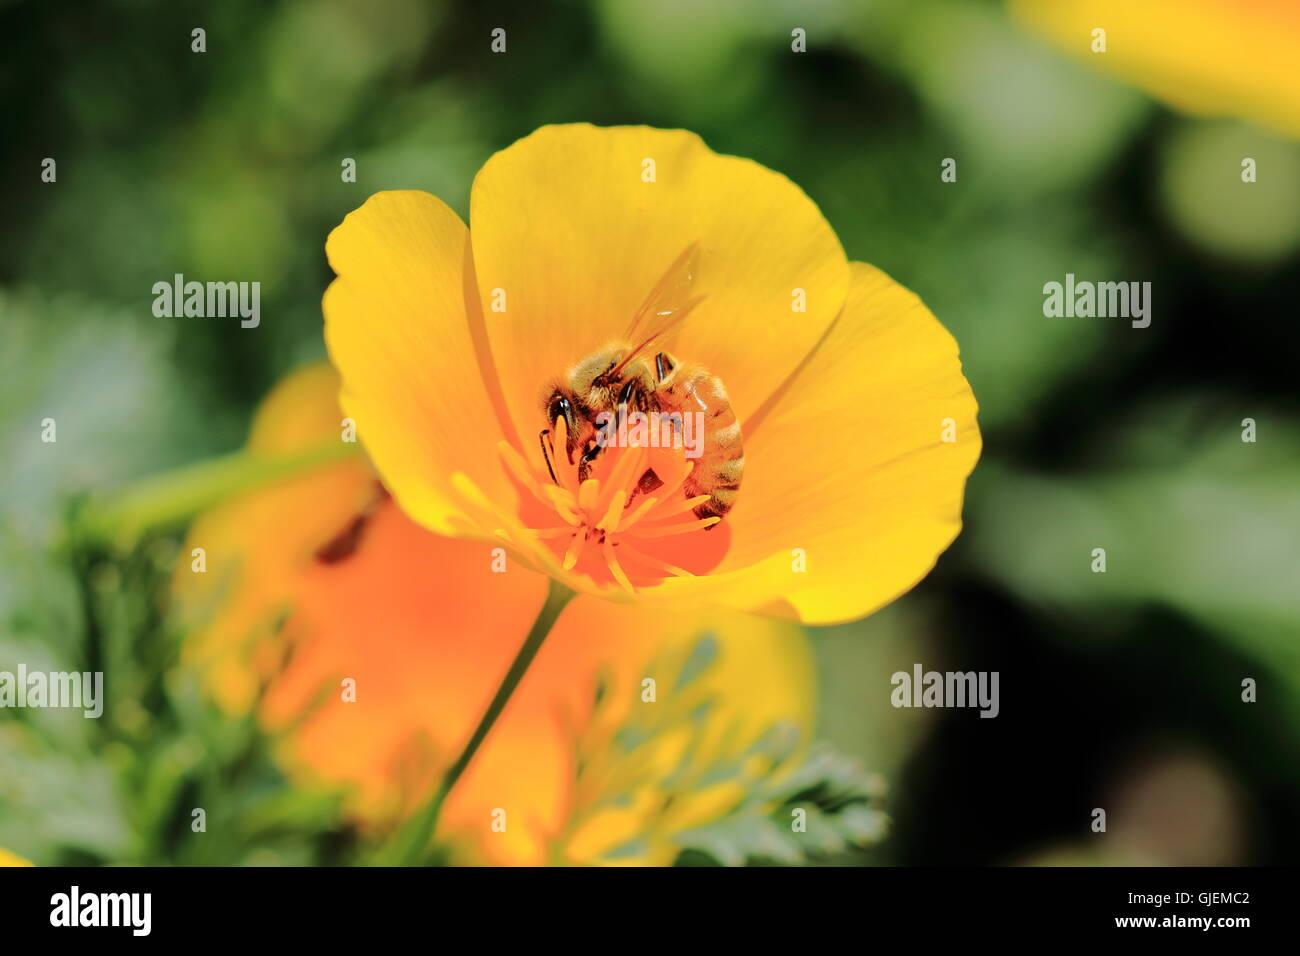 California Poppy, Eschscholzia californica with bee. - Stock Image